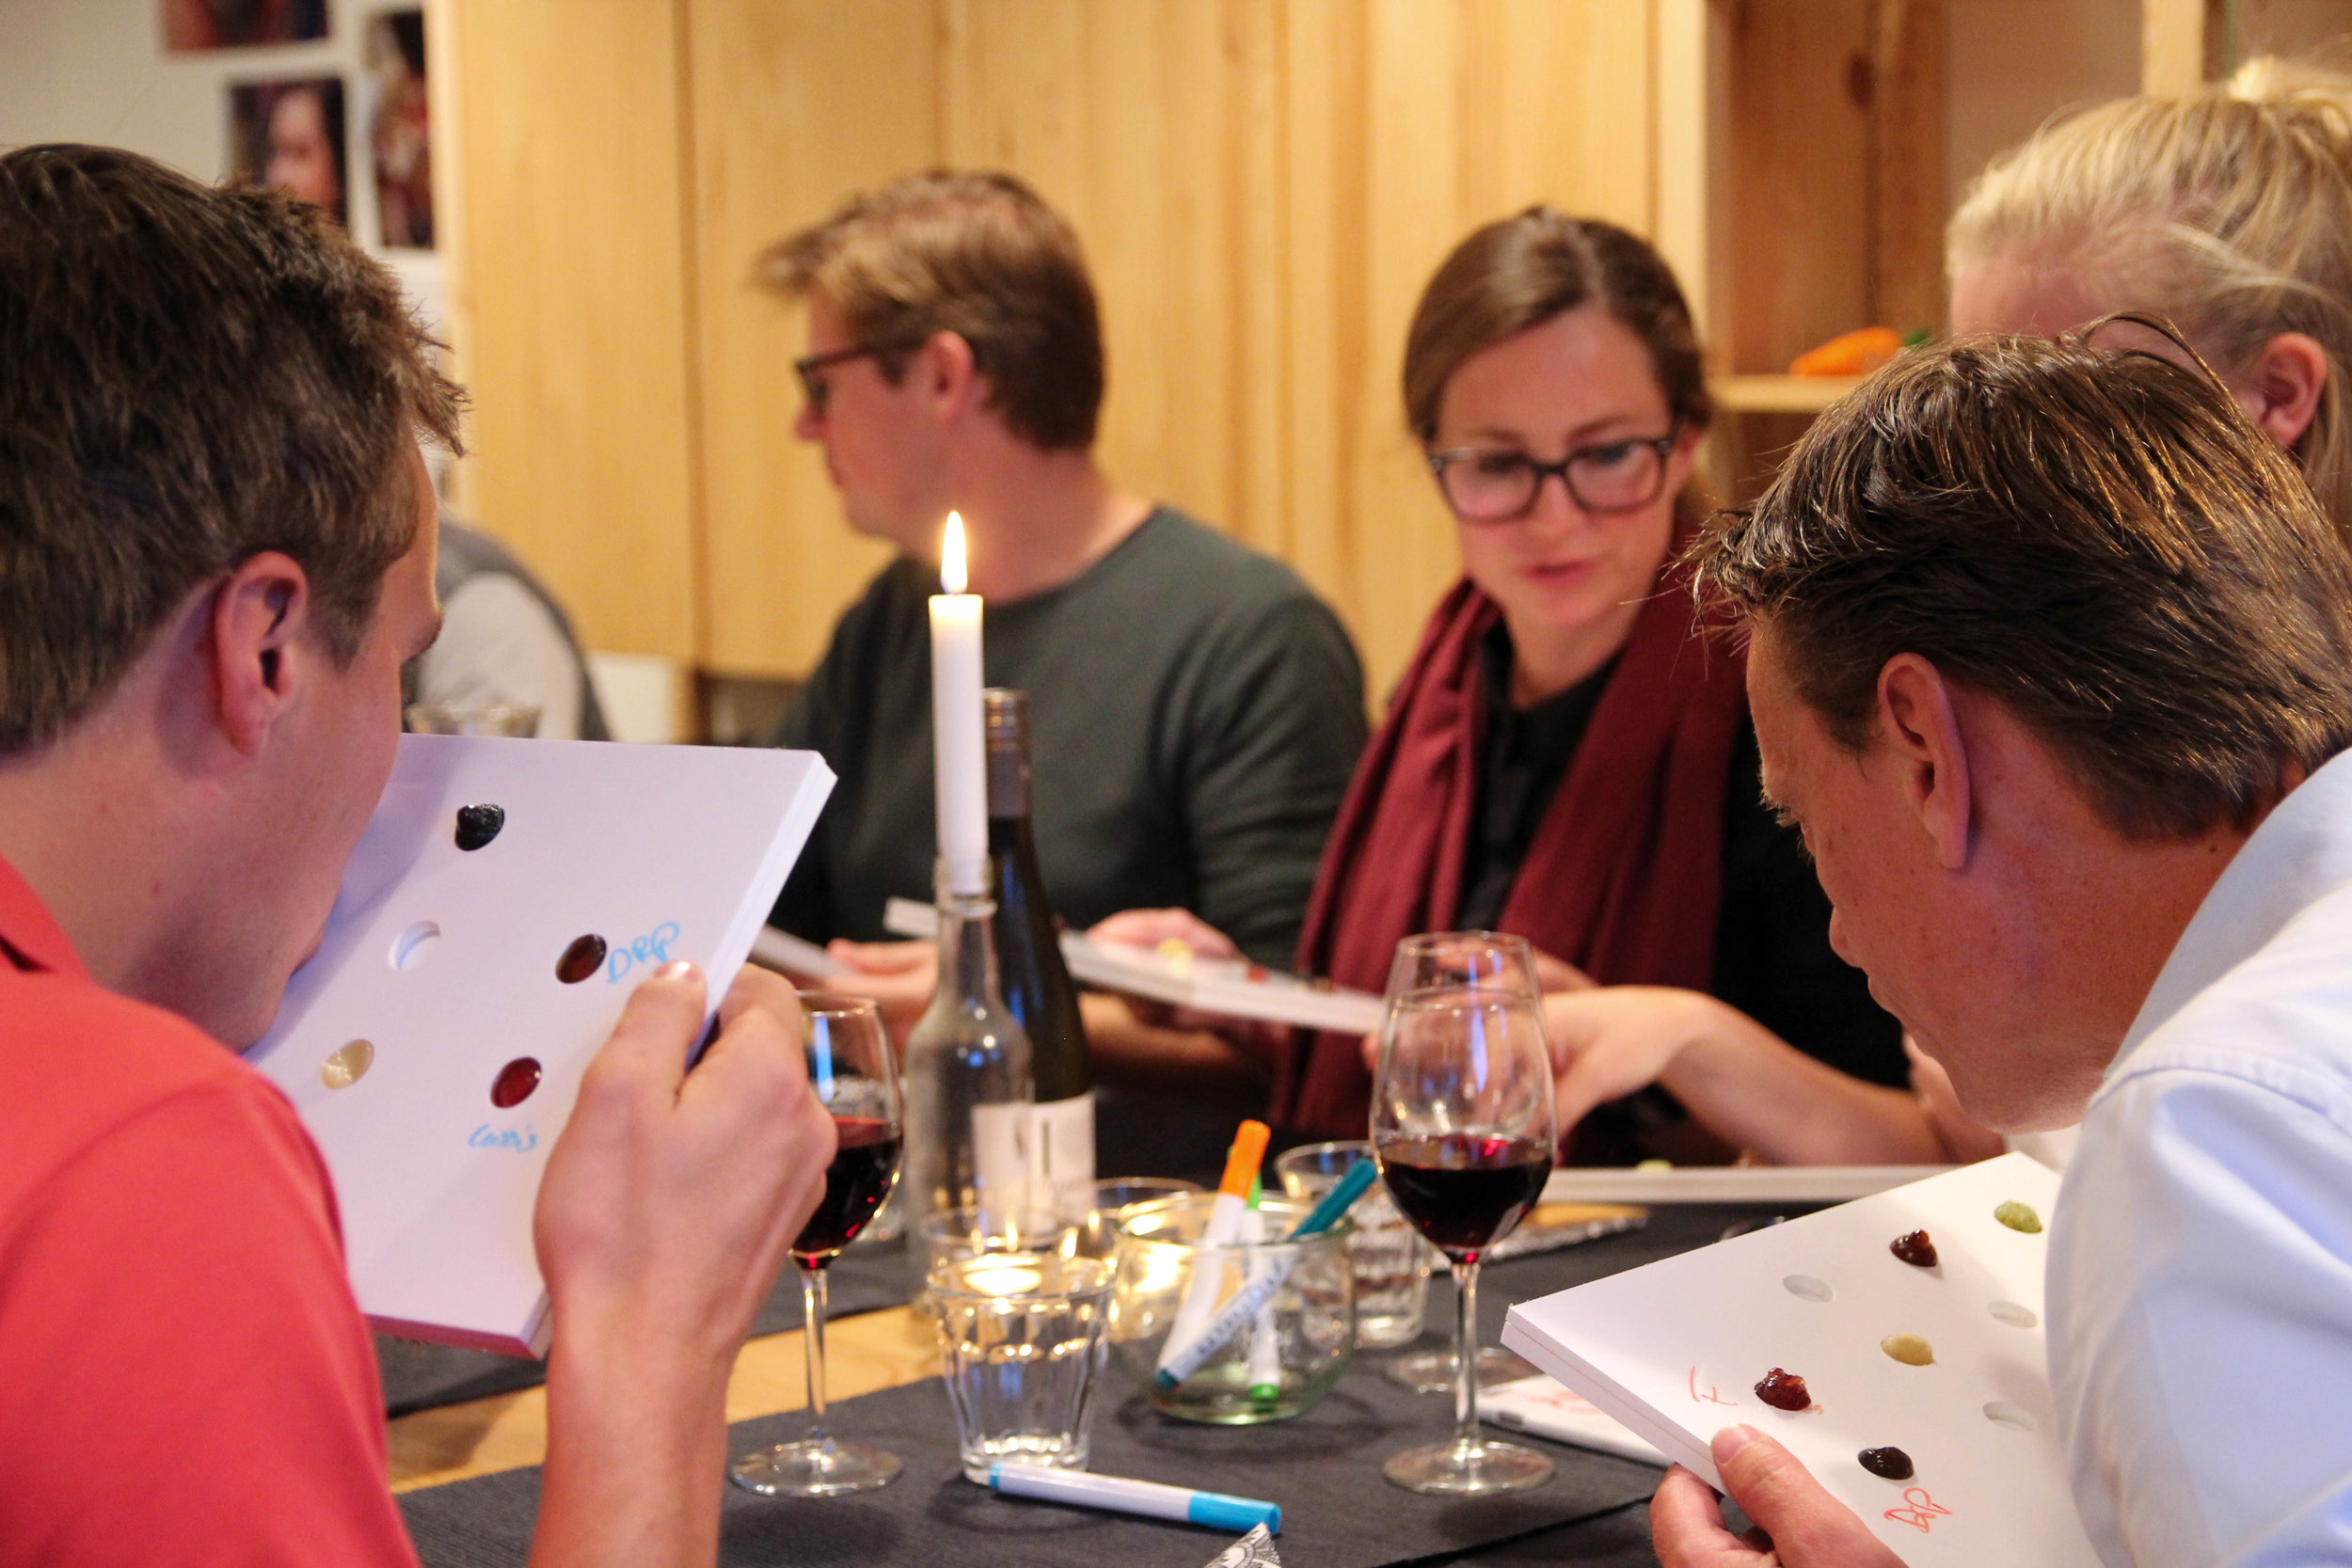 Experimental Dinners for Fresh Forward   Clients: GGZ, CocaCola, OTIB